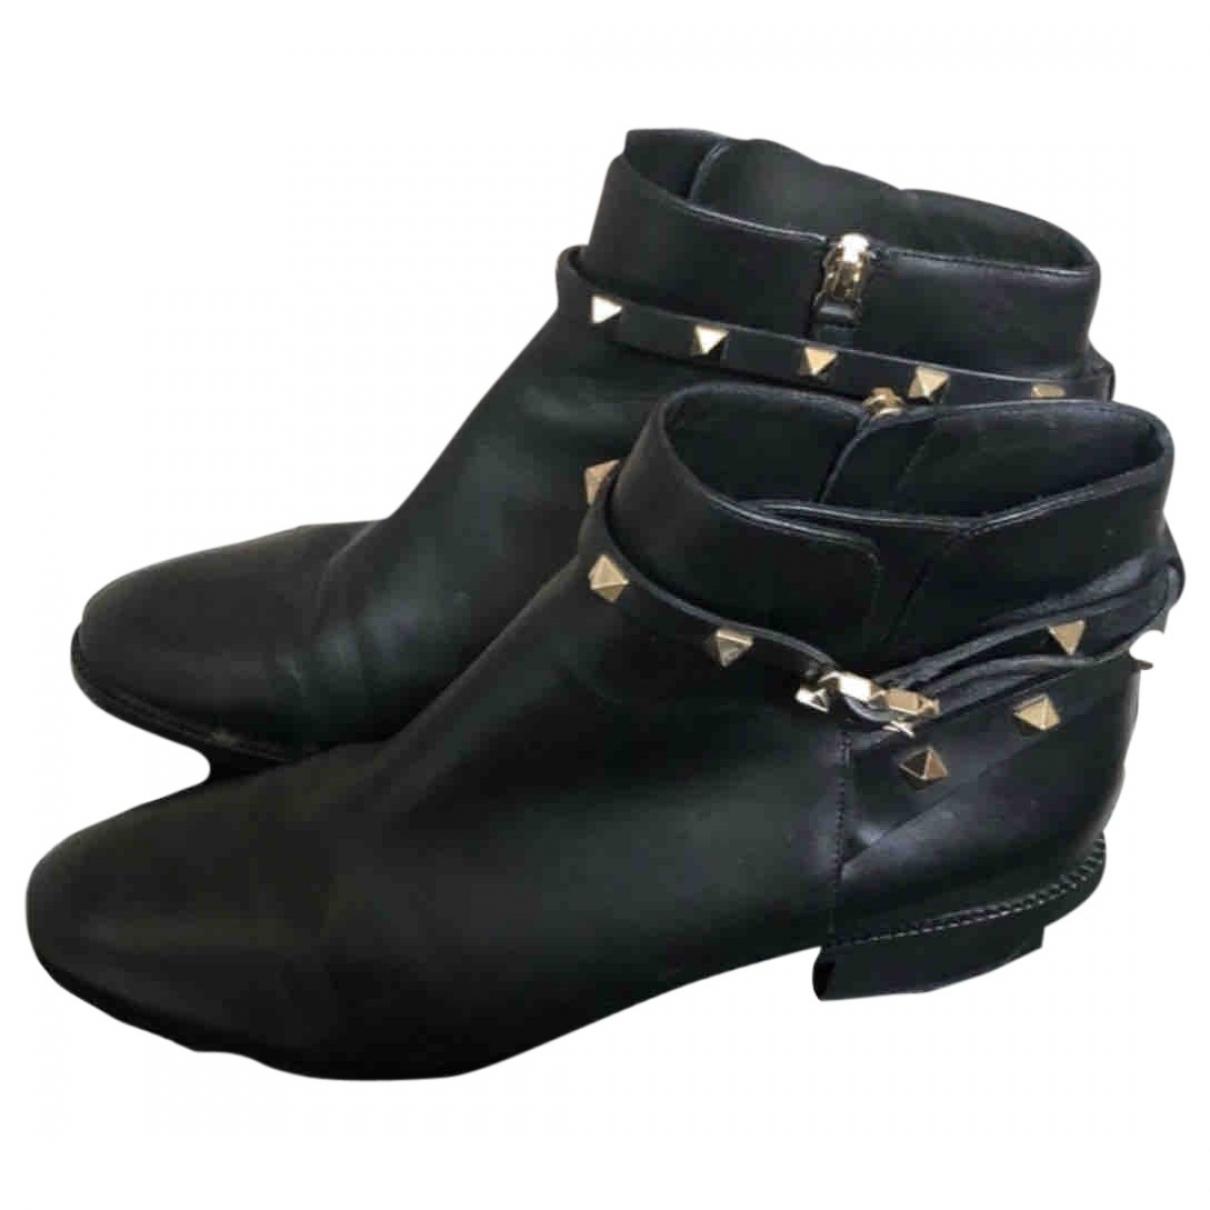 Valentino Garavani Rockstud Black Leather Ankle boots for Women 40 EU